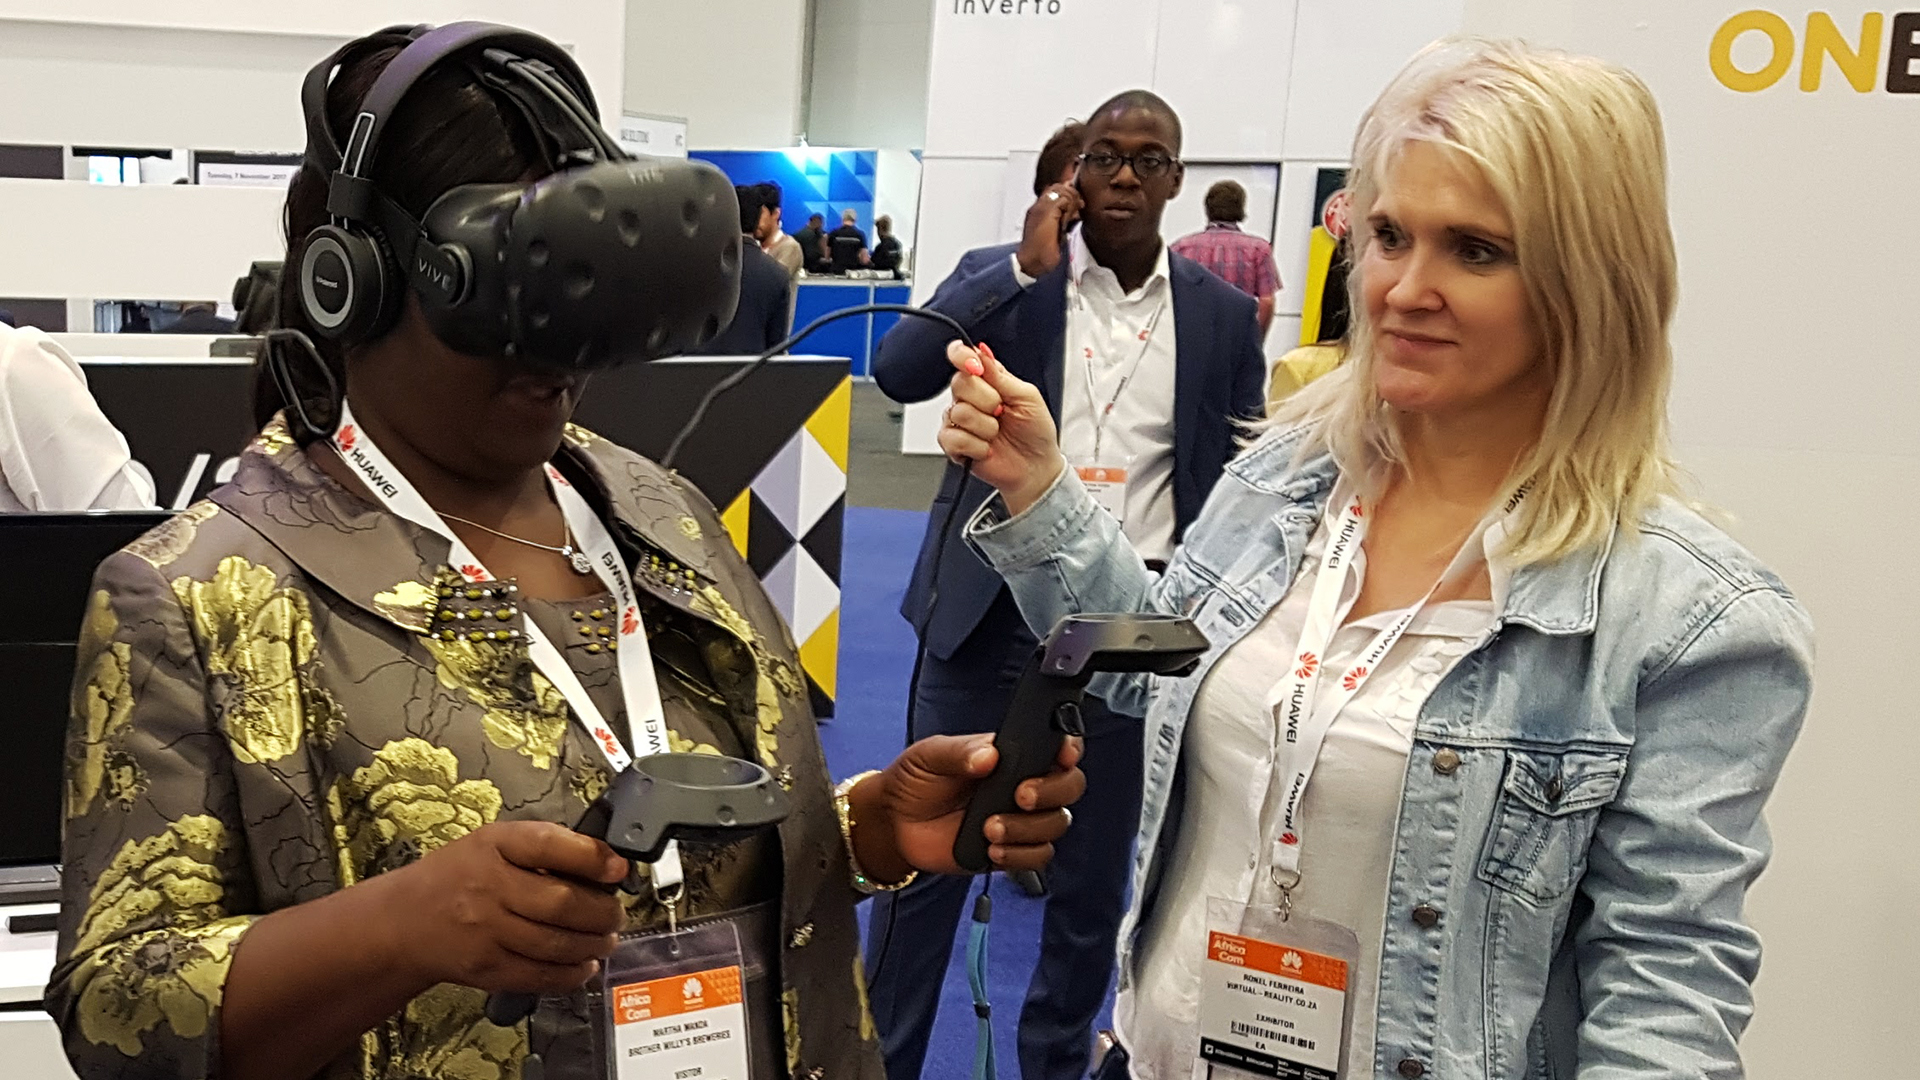 VR africacom